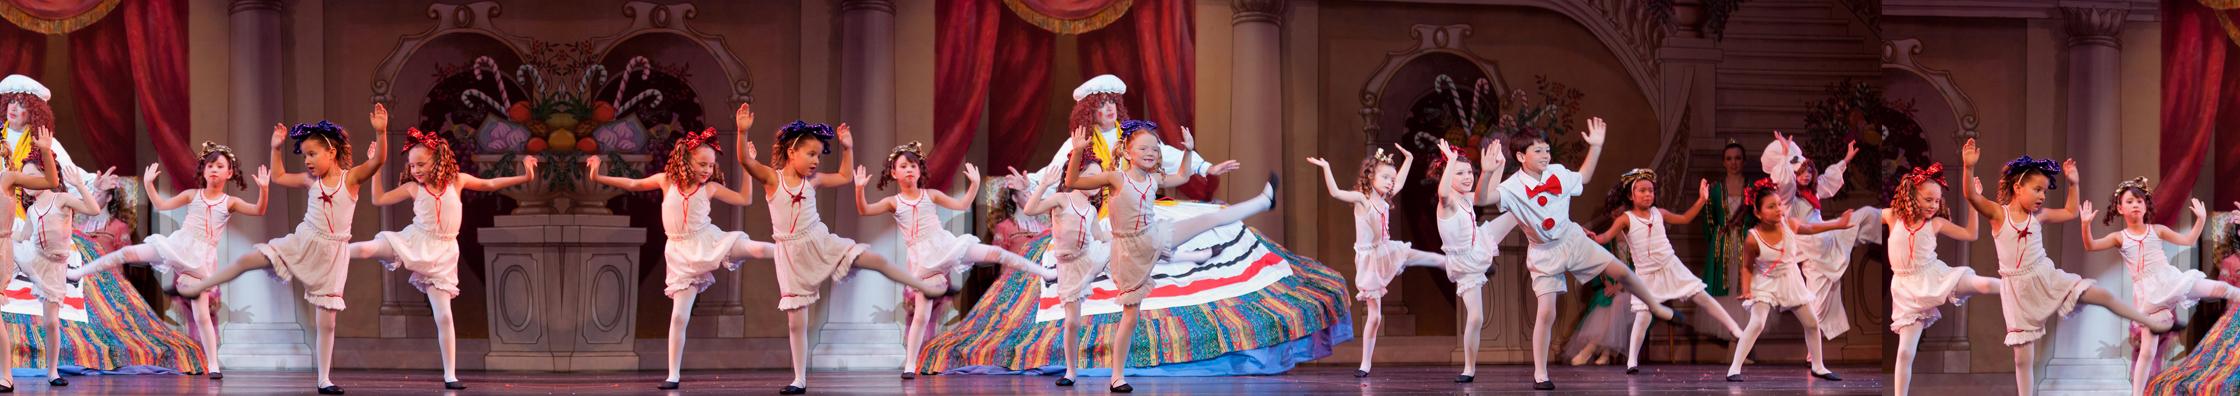 State street Arlington Theatre Nutcracker Santa Barbara Festival Ballet Tradition8